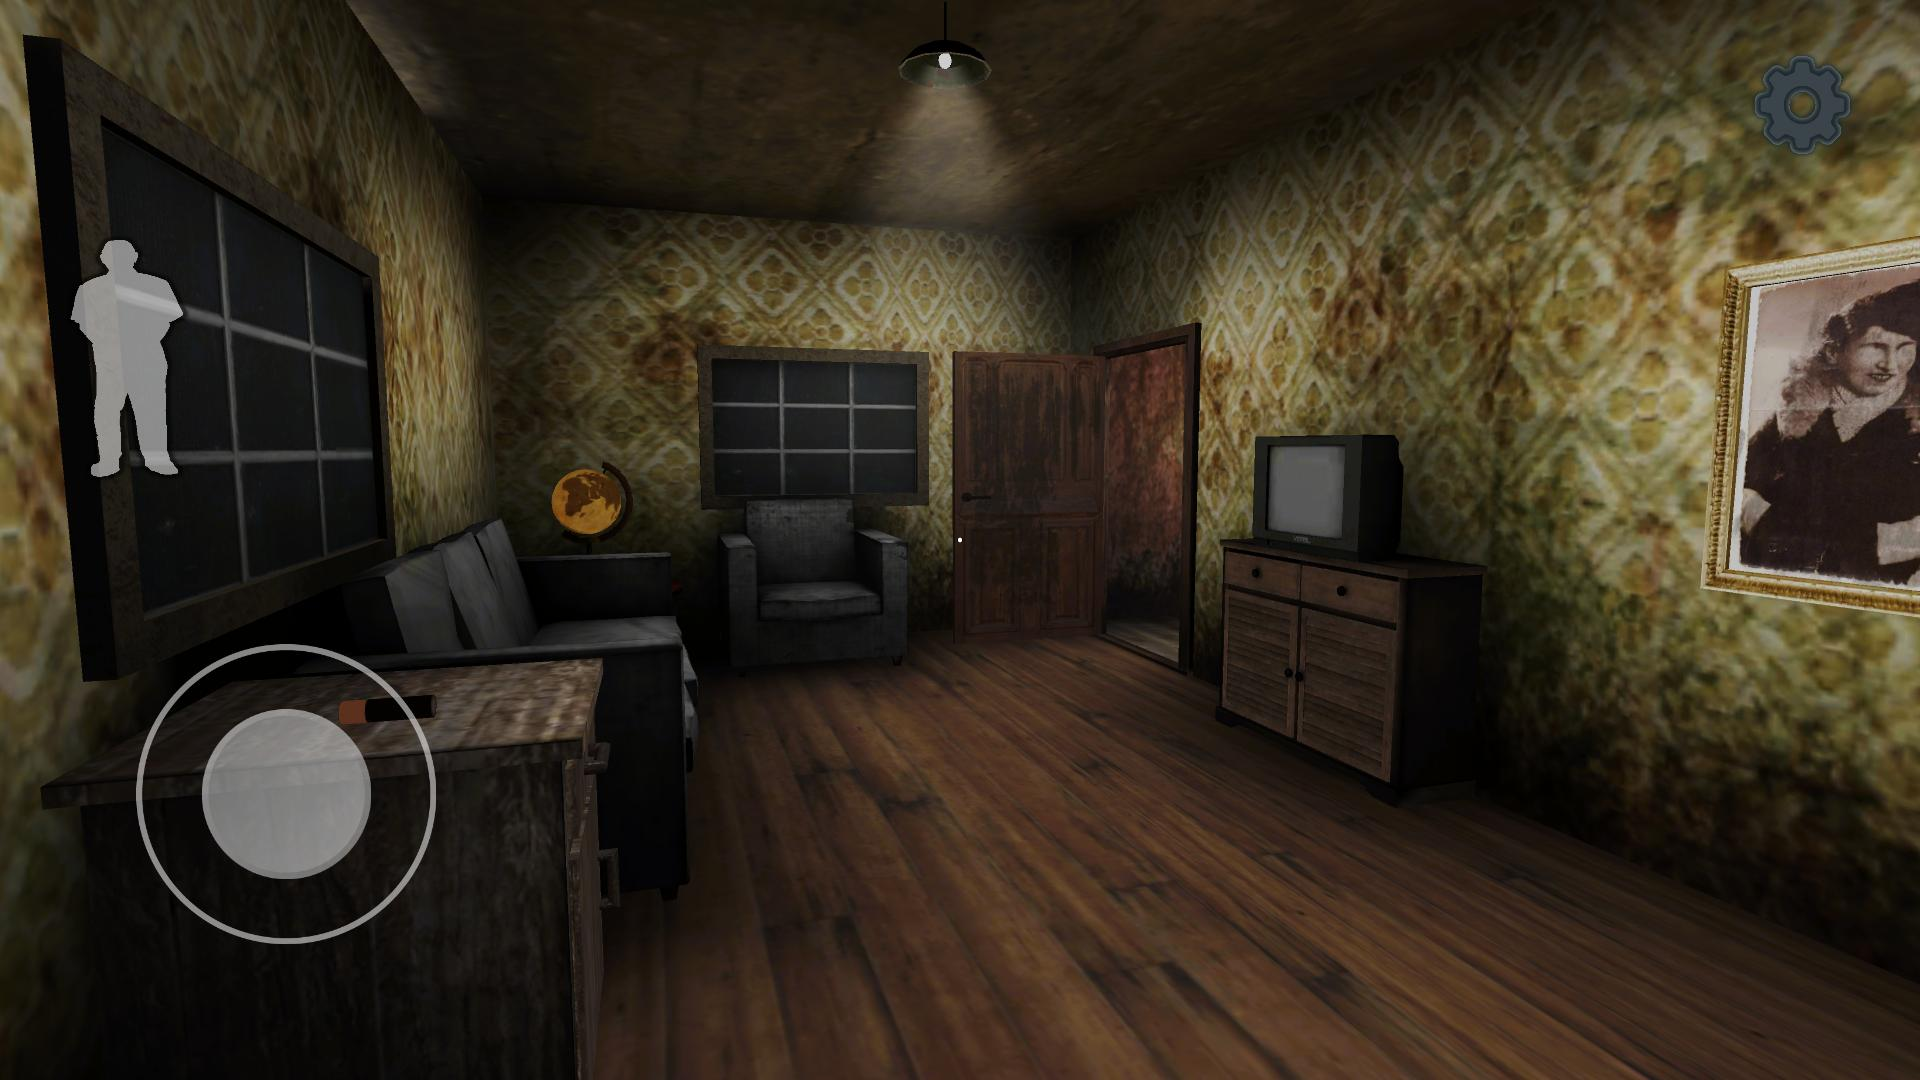 Evil Kid The Horror Game 1.1.9.5.4.4 Screenshot 6